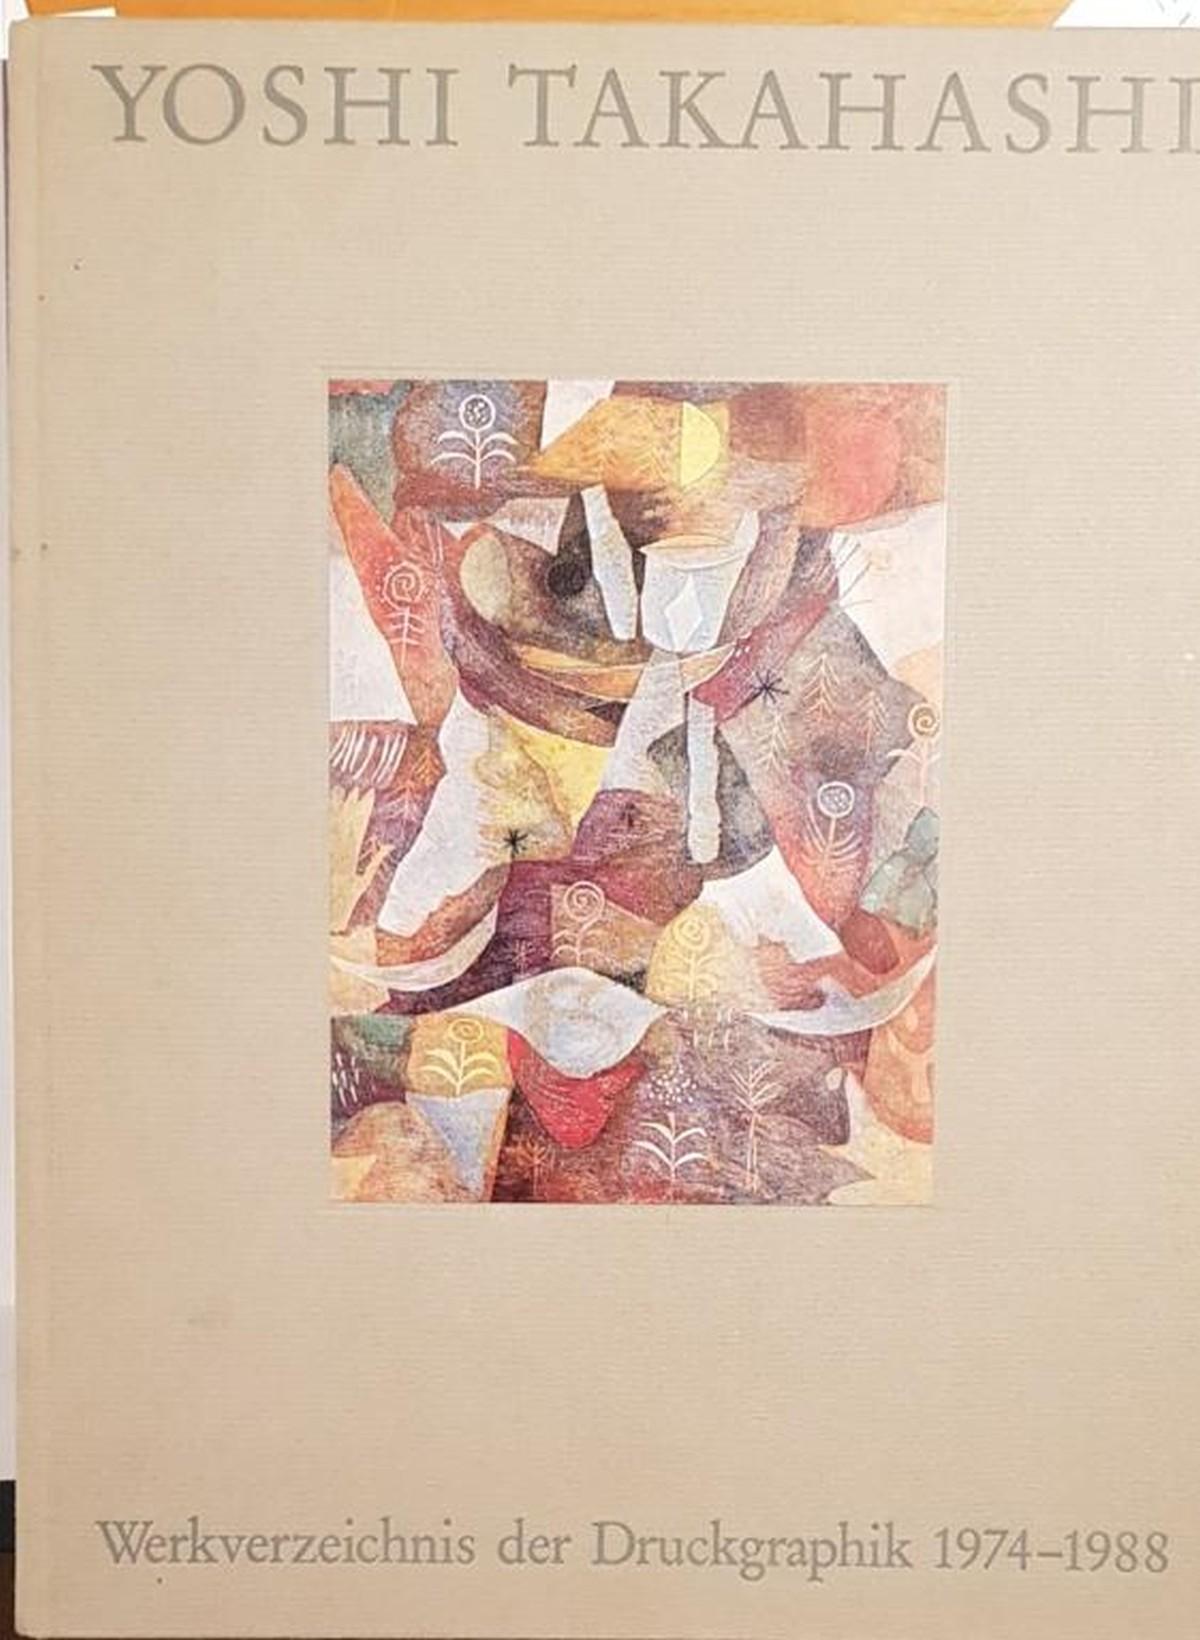 Yoshi Takahashi - Yoshi Takahashi Werksverzeichnis der Druckgraphik 1974-1988 kopen? Bied vanaf 30!